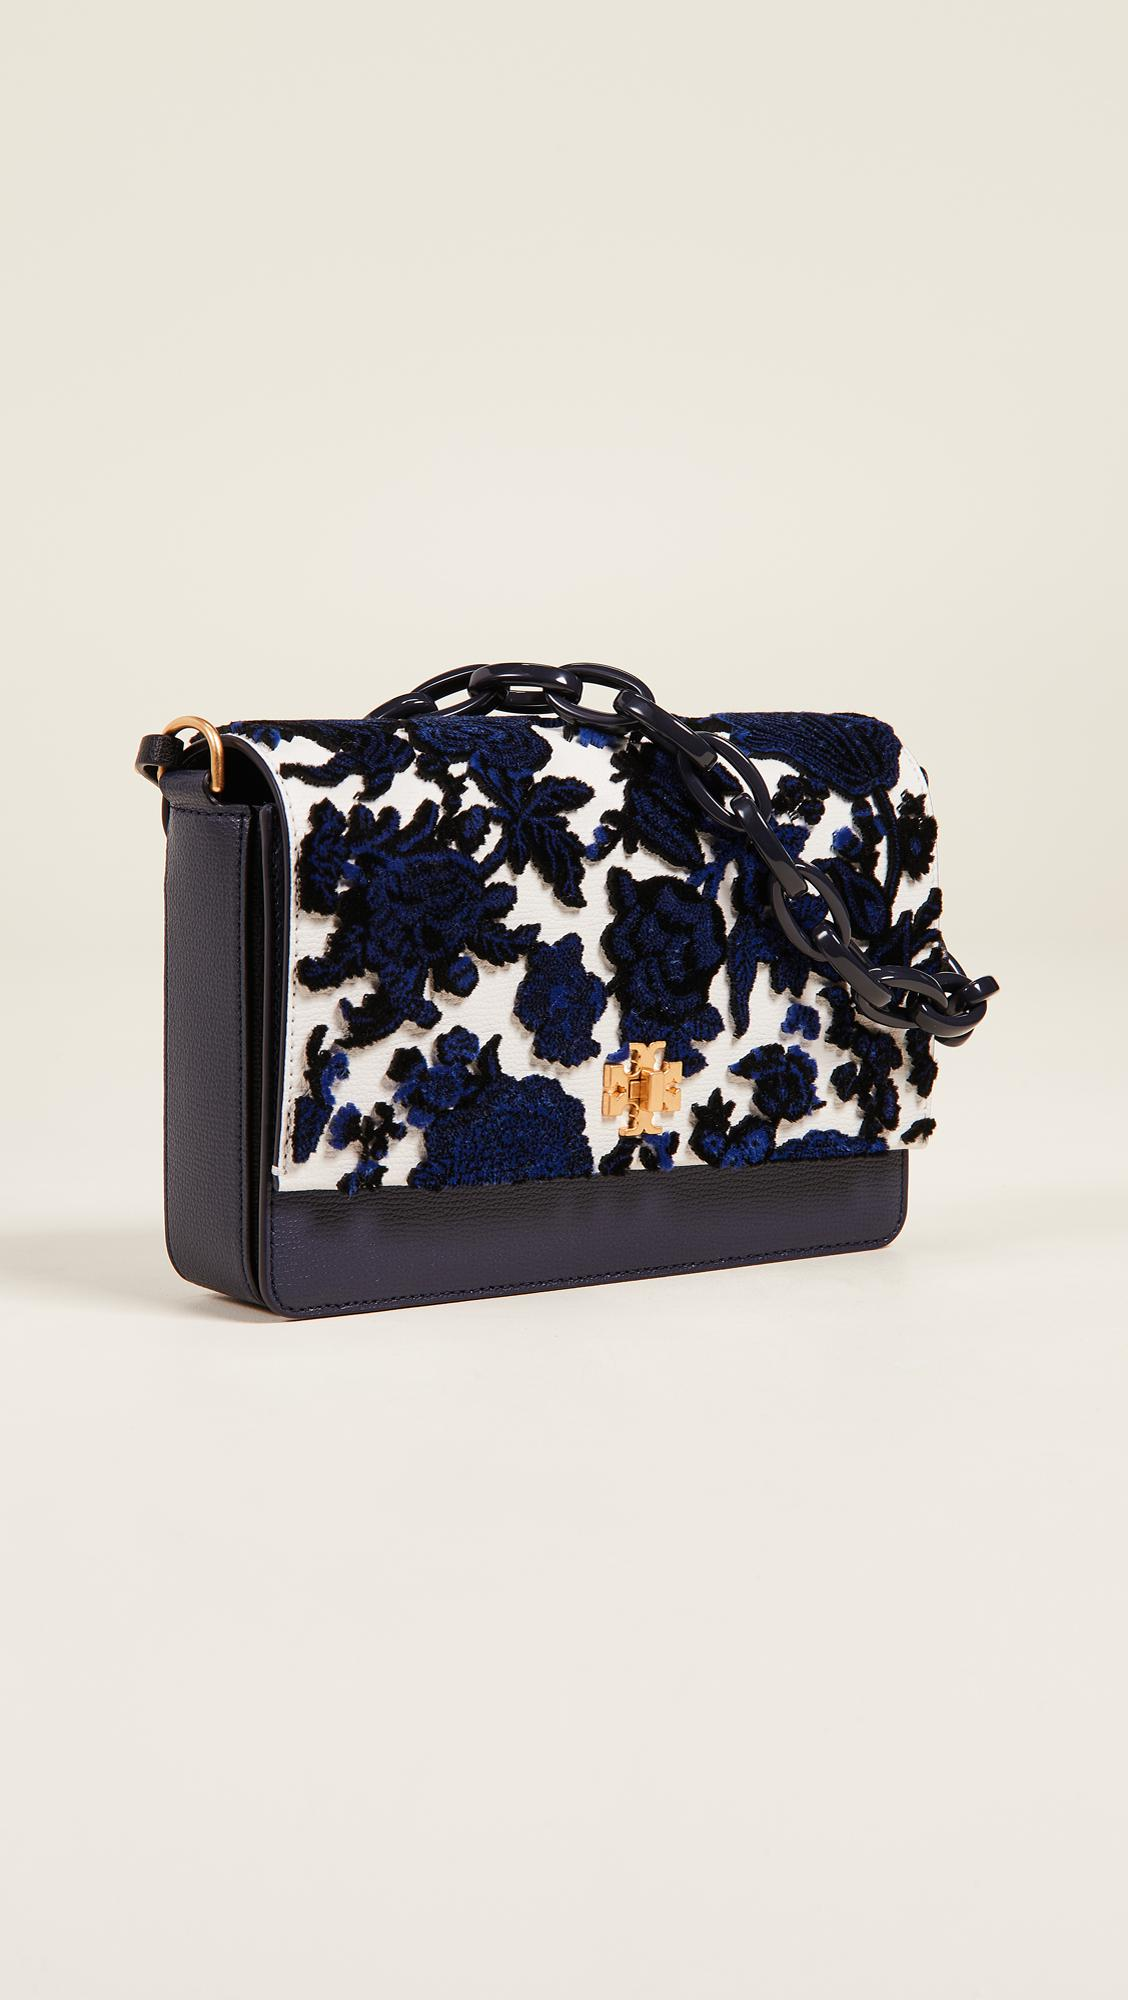 d873c5f24d5 Tory Burch Kira Fil Coupe Shoulder Bag in Blue - Save 8% - Lyst